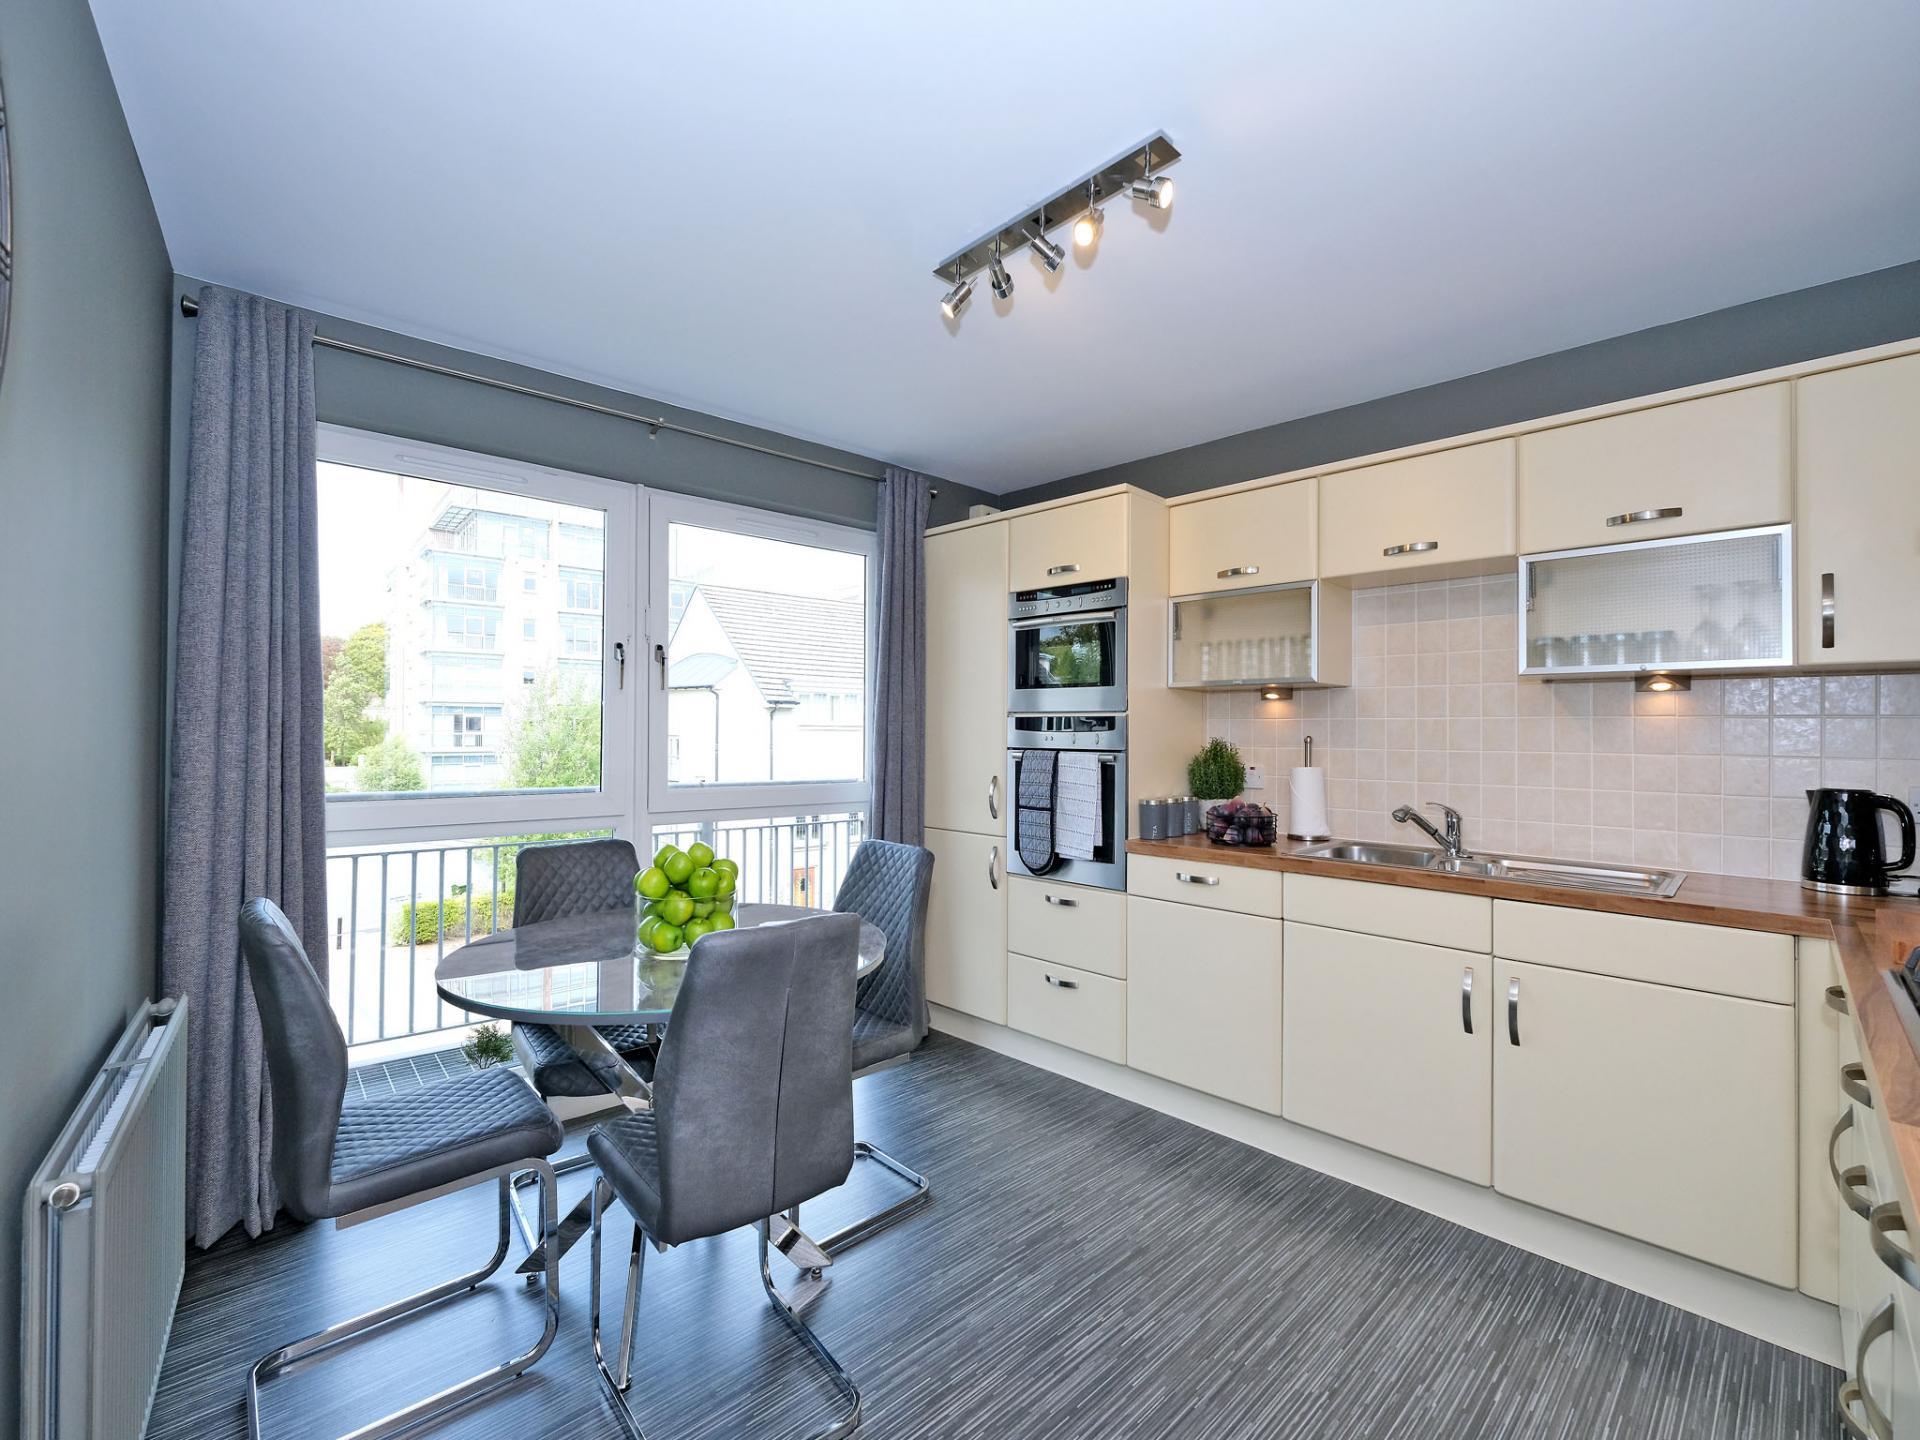 Kitchen at Kepplestone Apartments, Mannofield, Aberdeen - Citybase Apartments